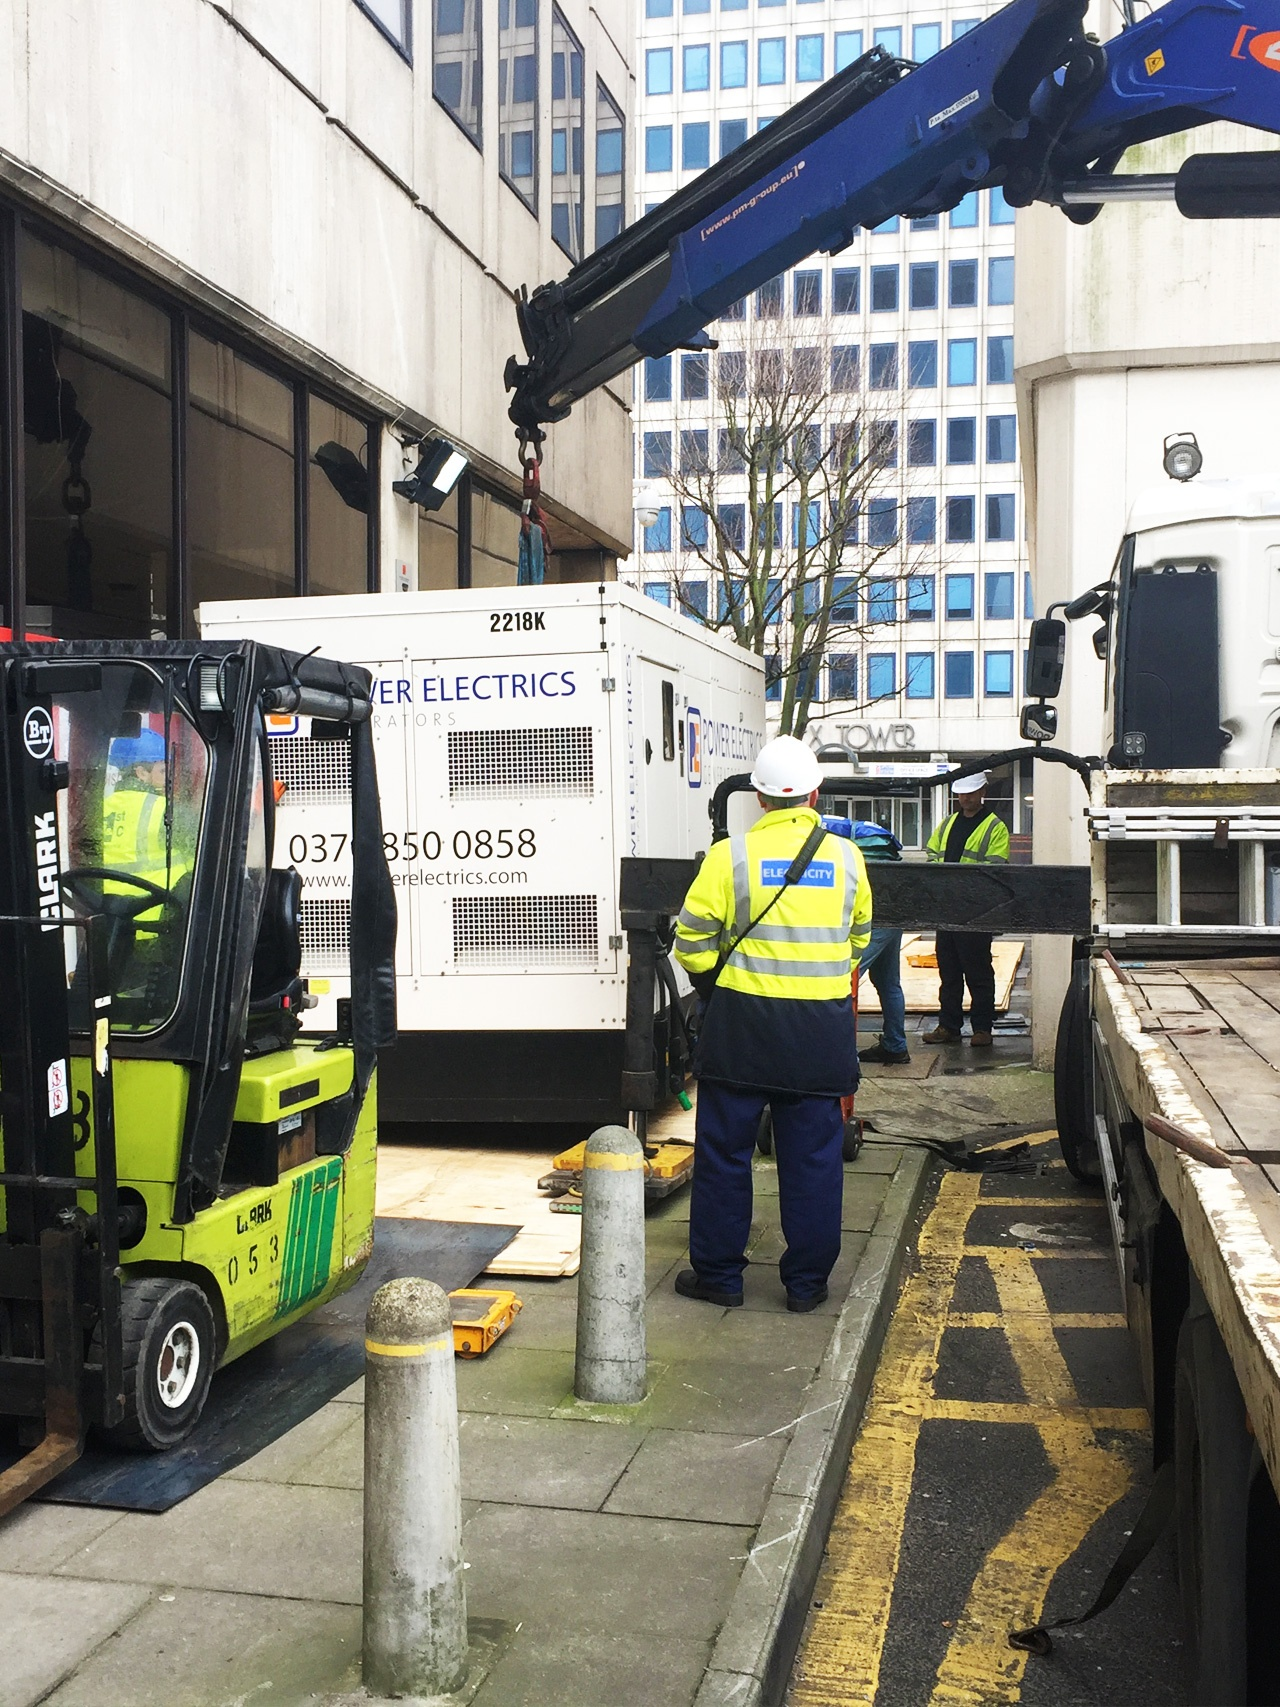 Plant handling job in London